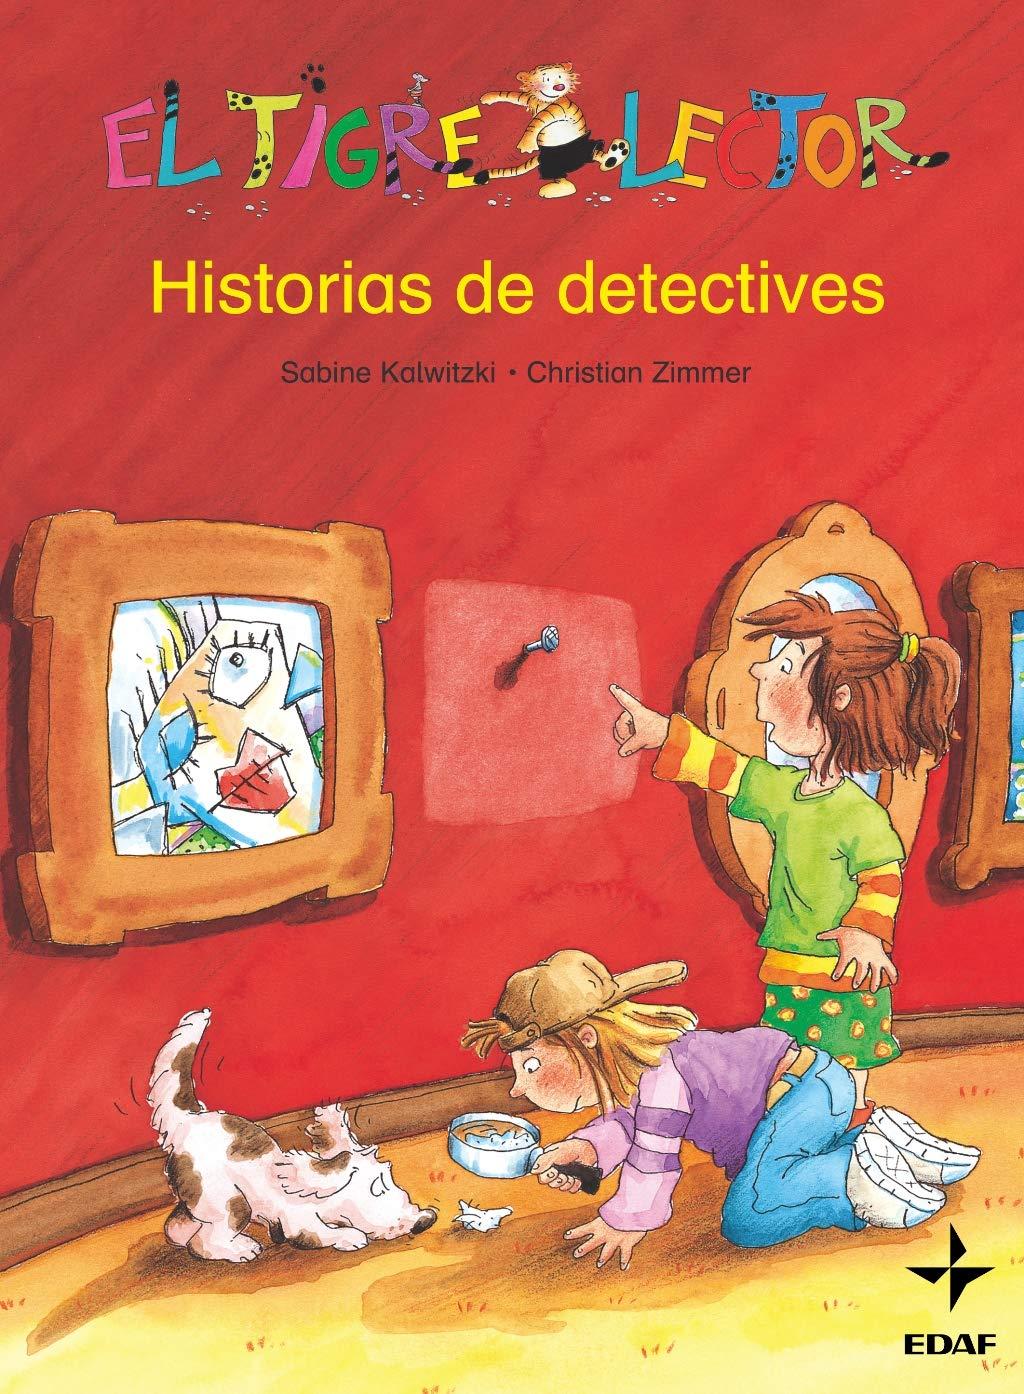 Historia De Detectives (Escalera de Lectura): Amazon.es: Kalwitzki, Sabine, Zimmer, Christian, Zimmer, Christian, Gómez, Susana: Libros